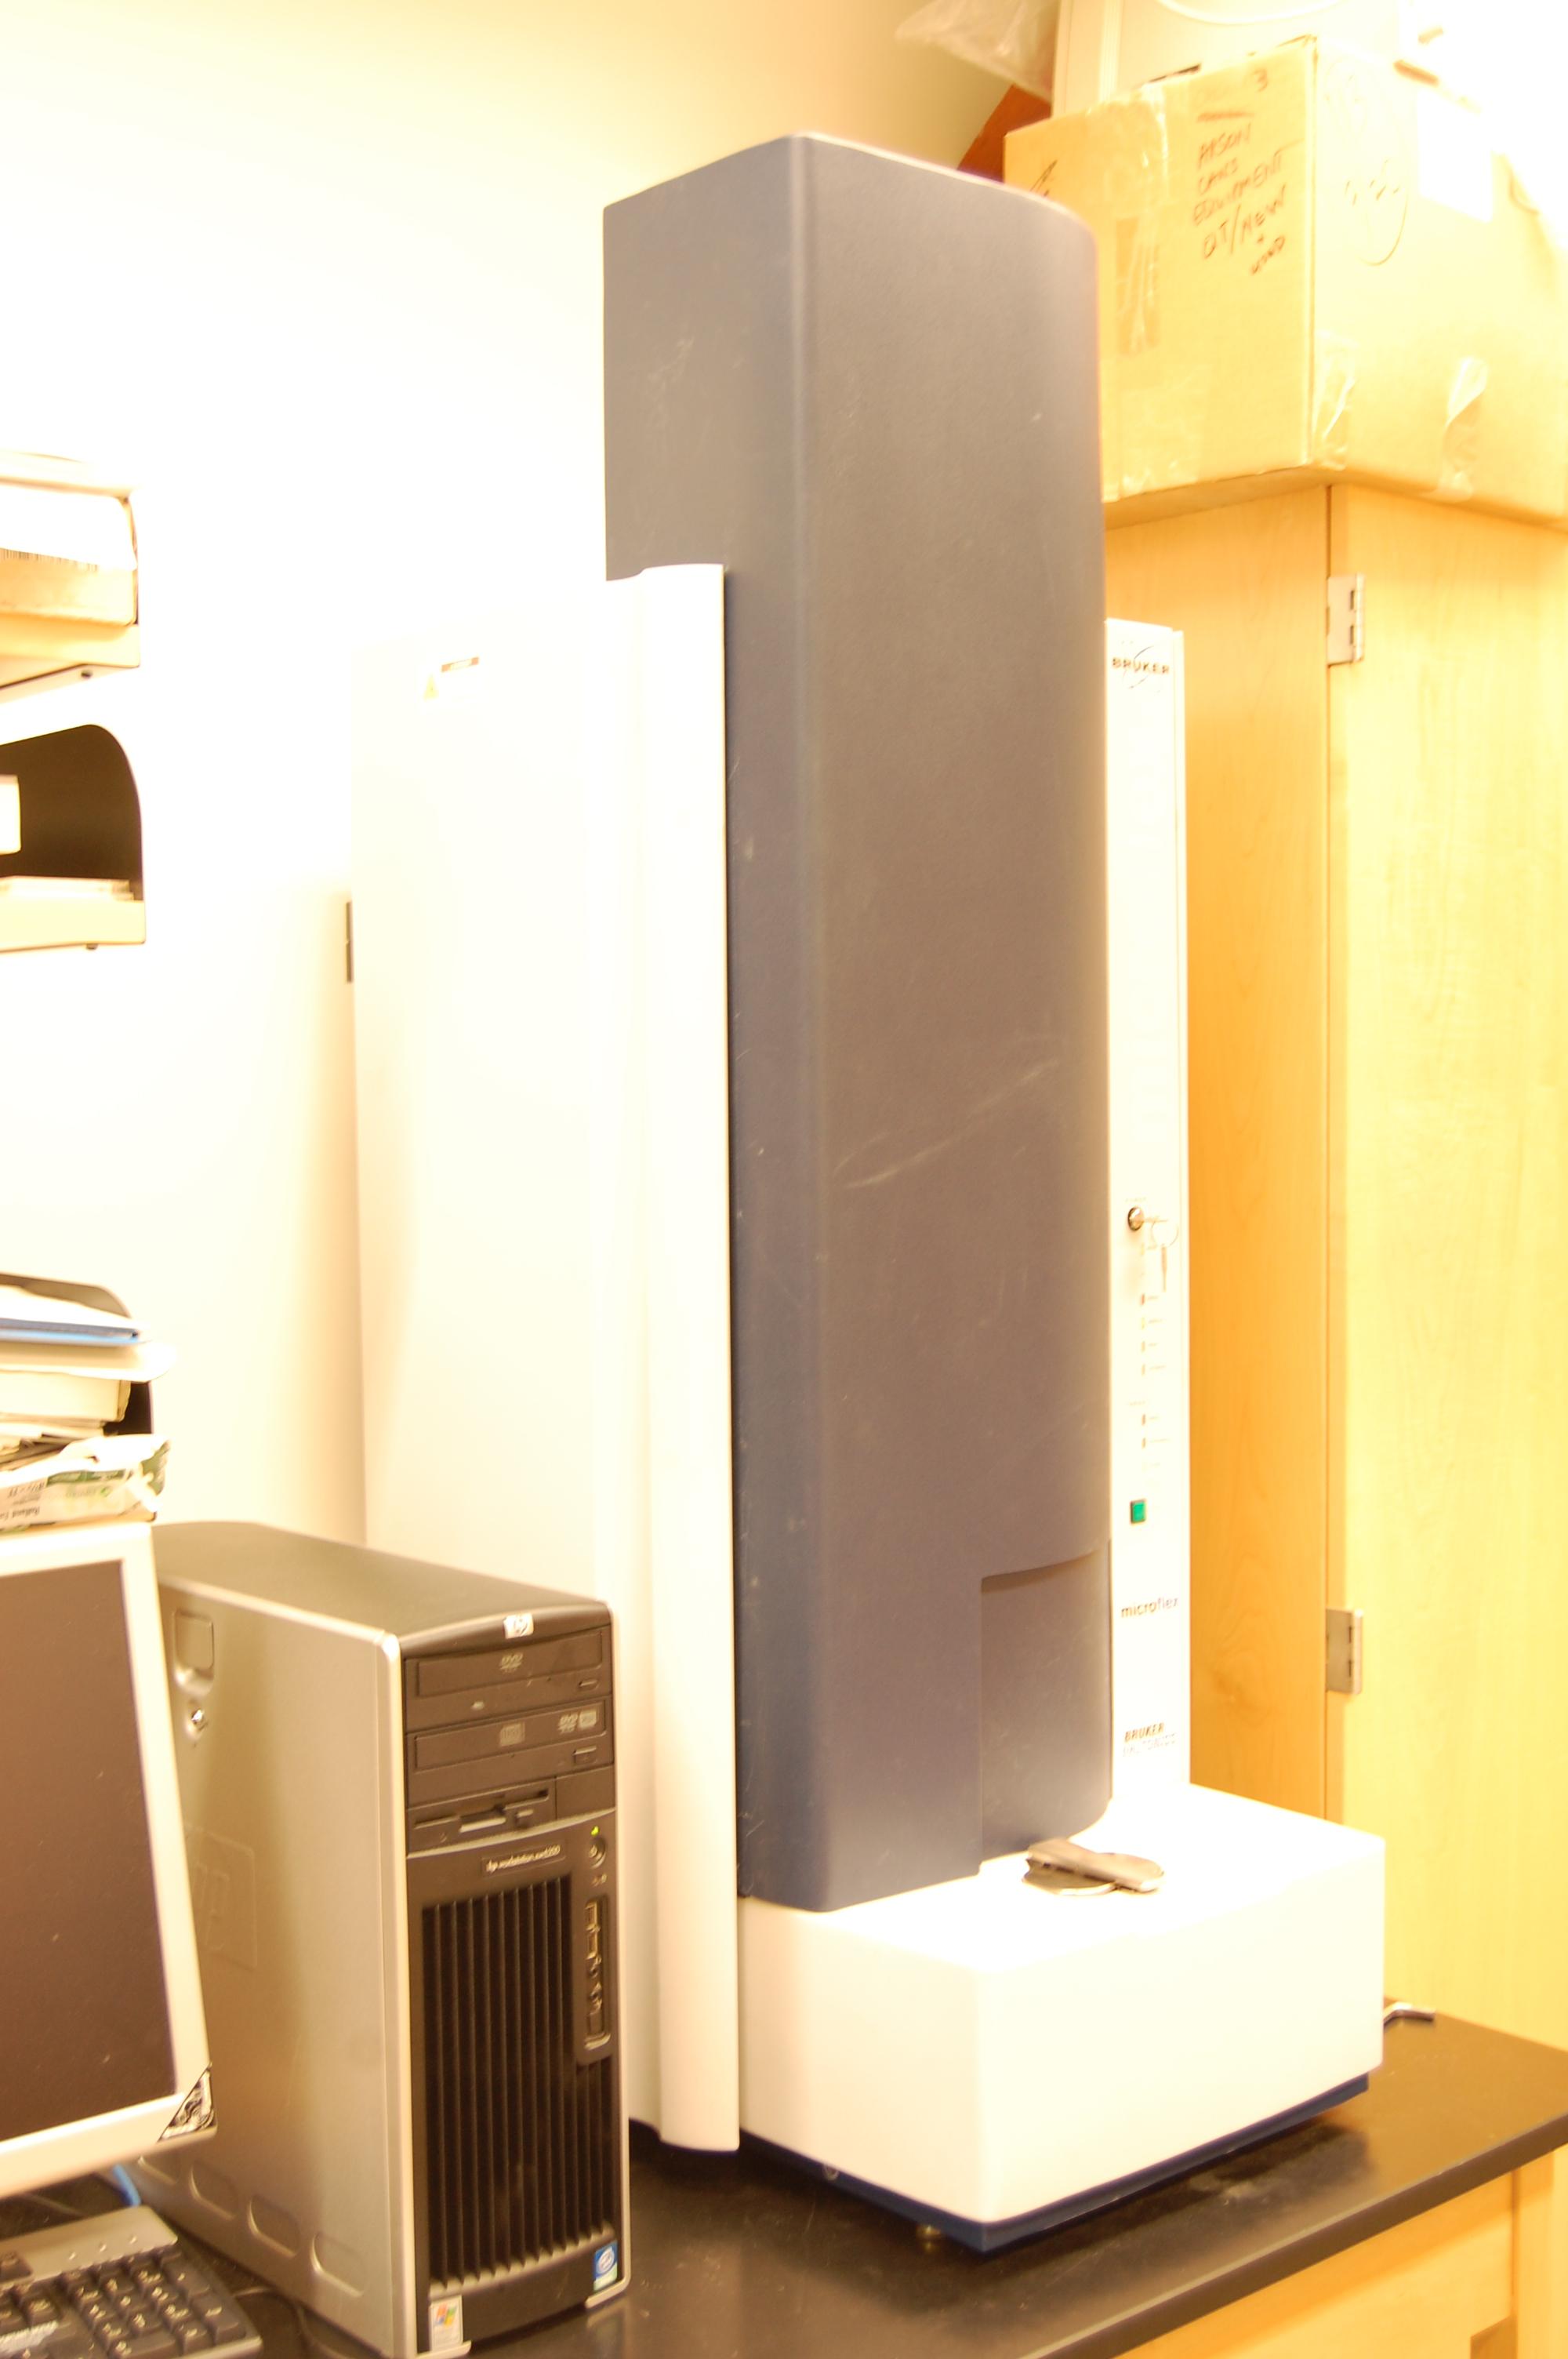 Location: Morley Science Room 230